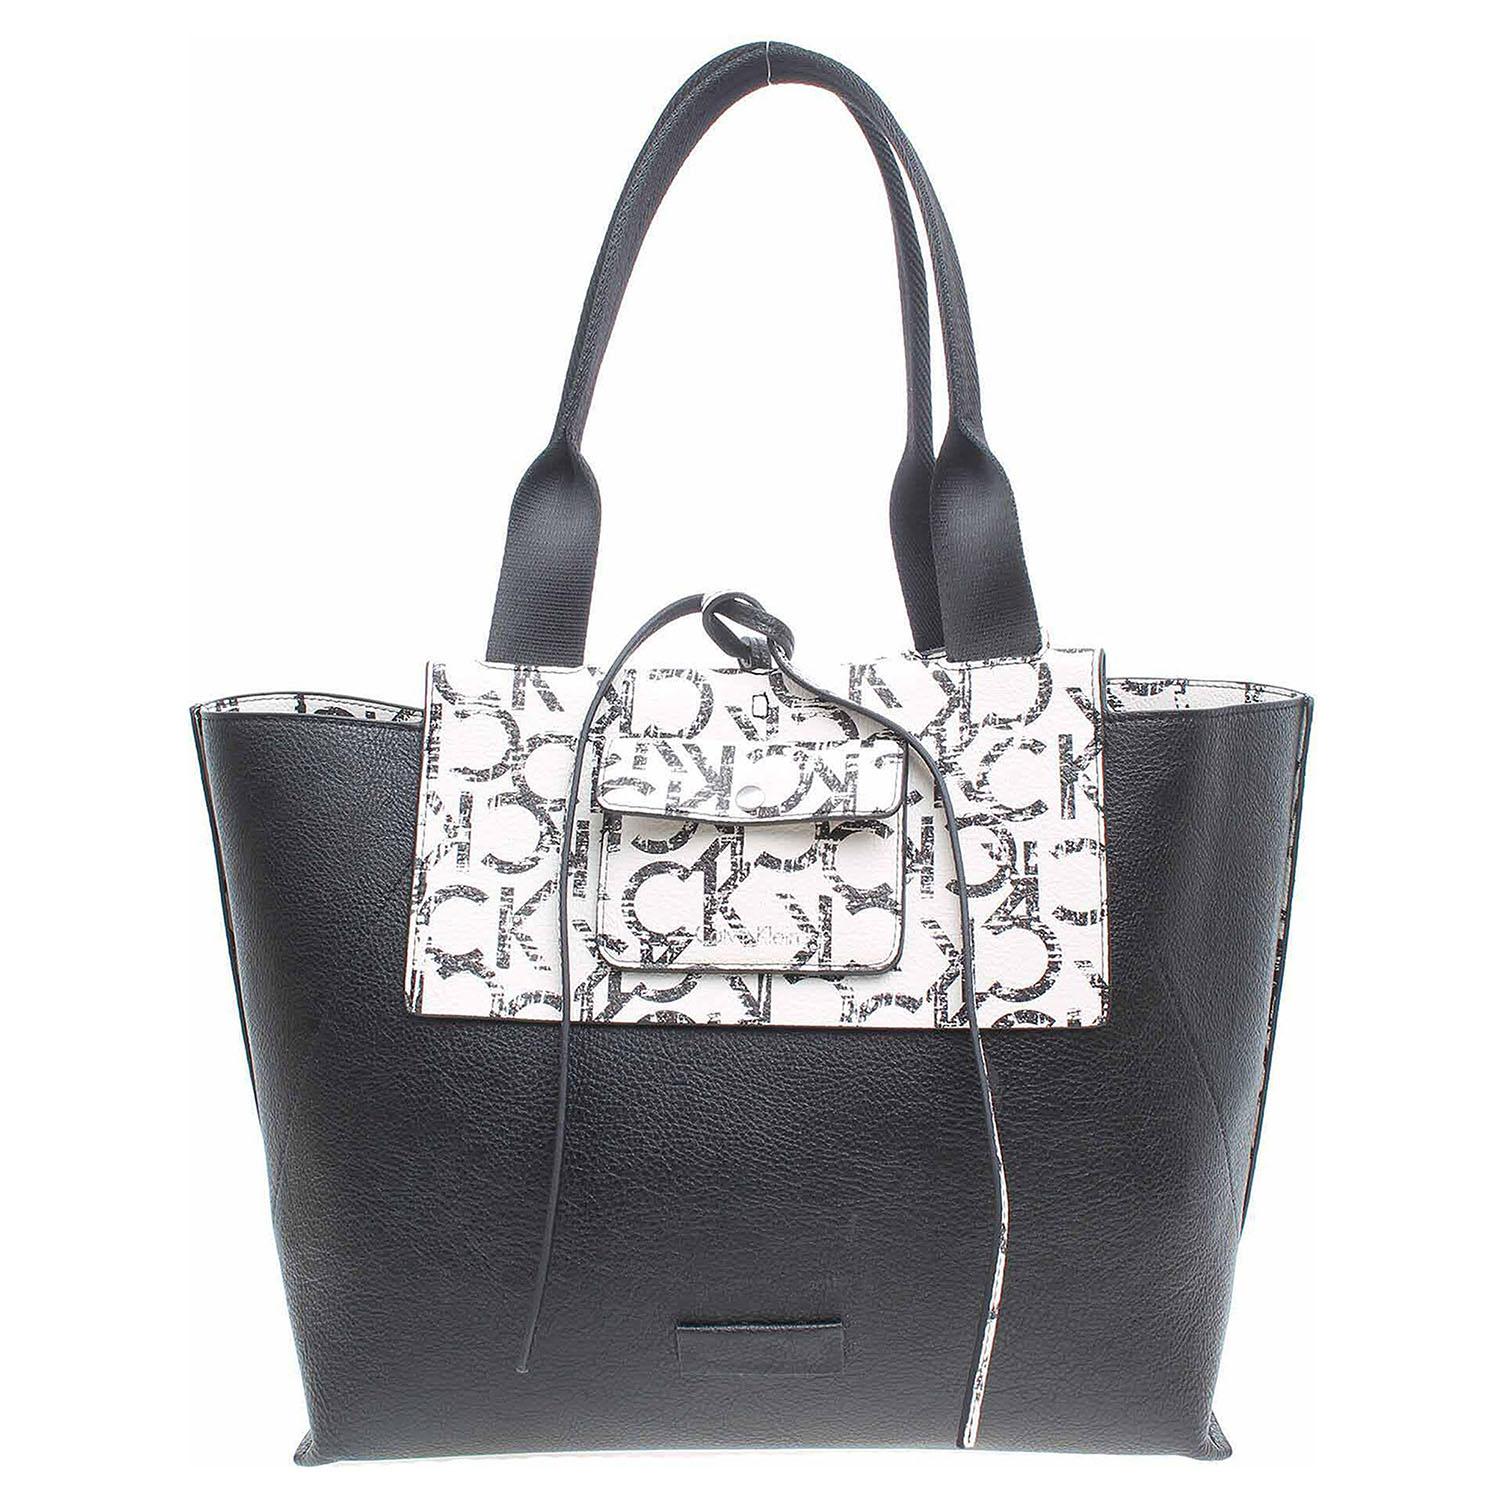 Ecco Calvin Klein dámská kabelka K60K602519904 bílá 11891163